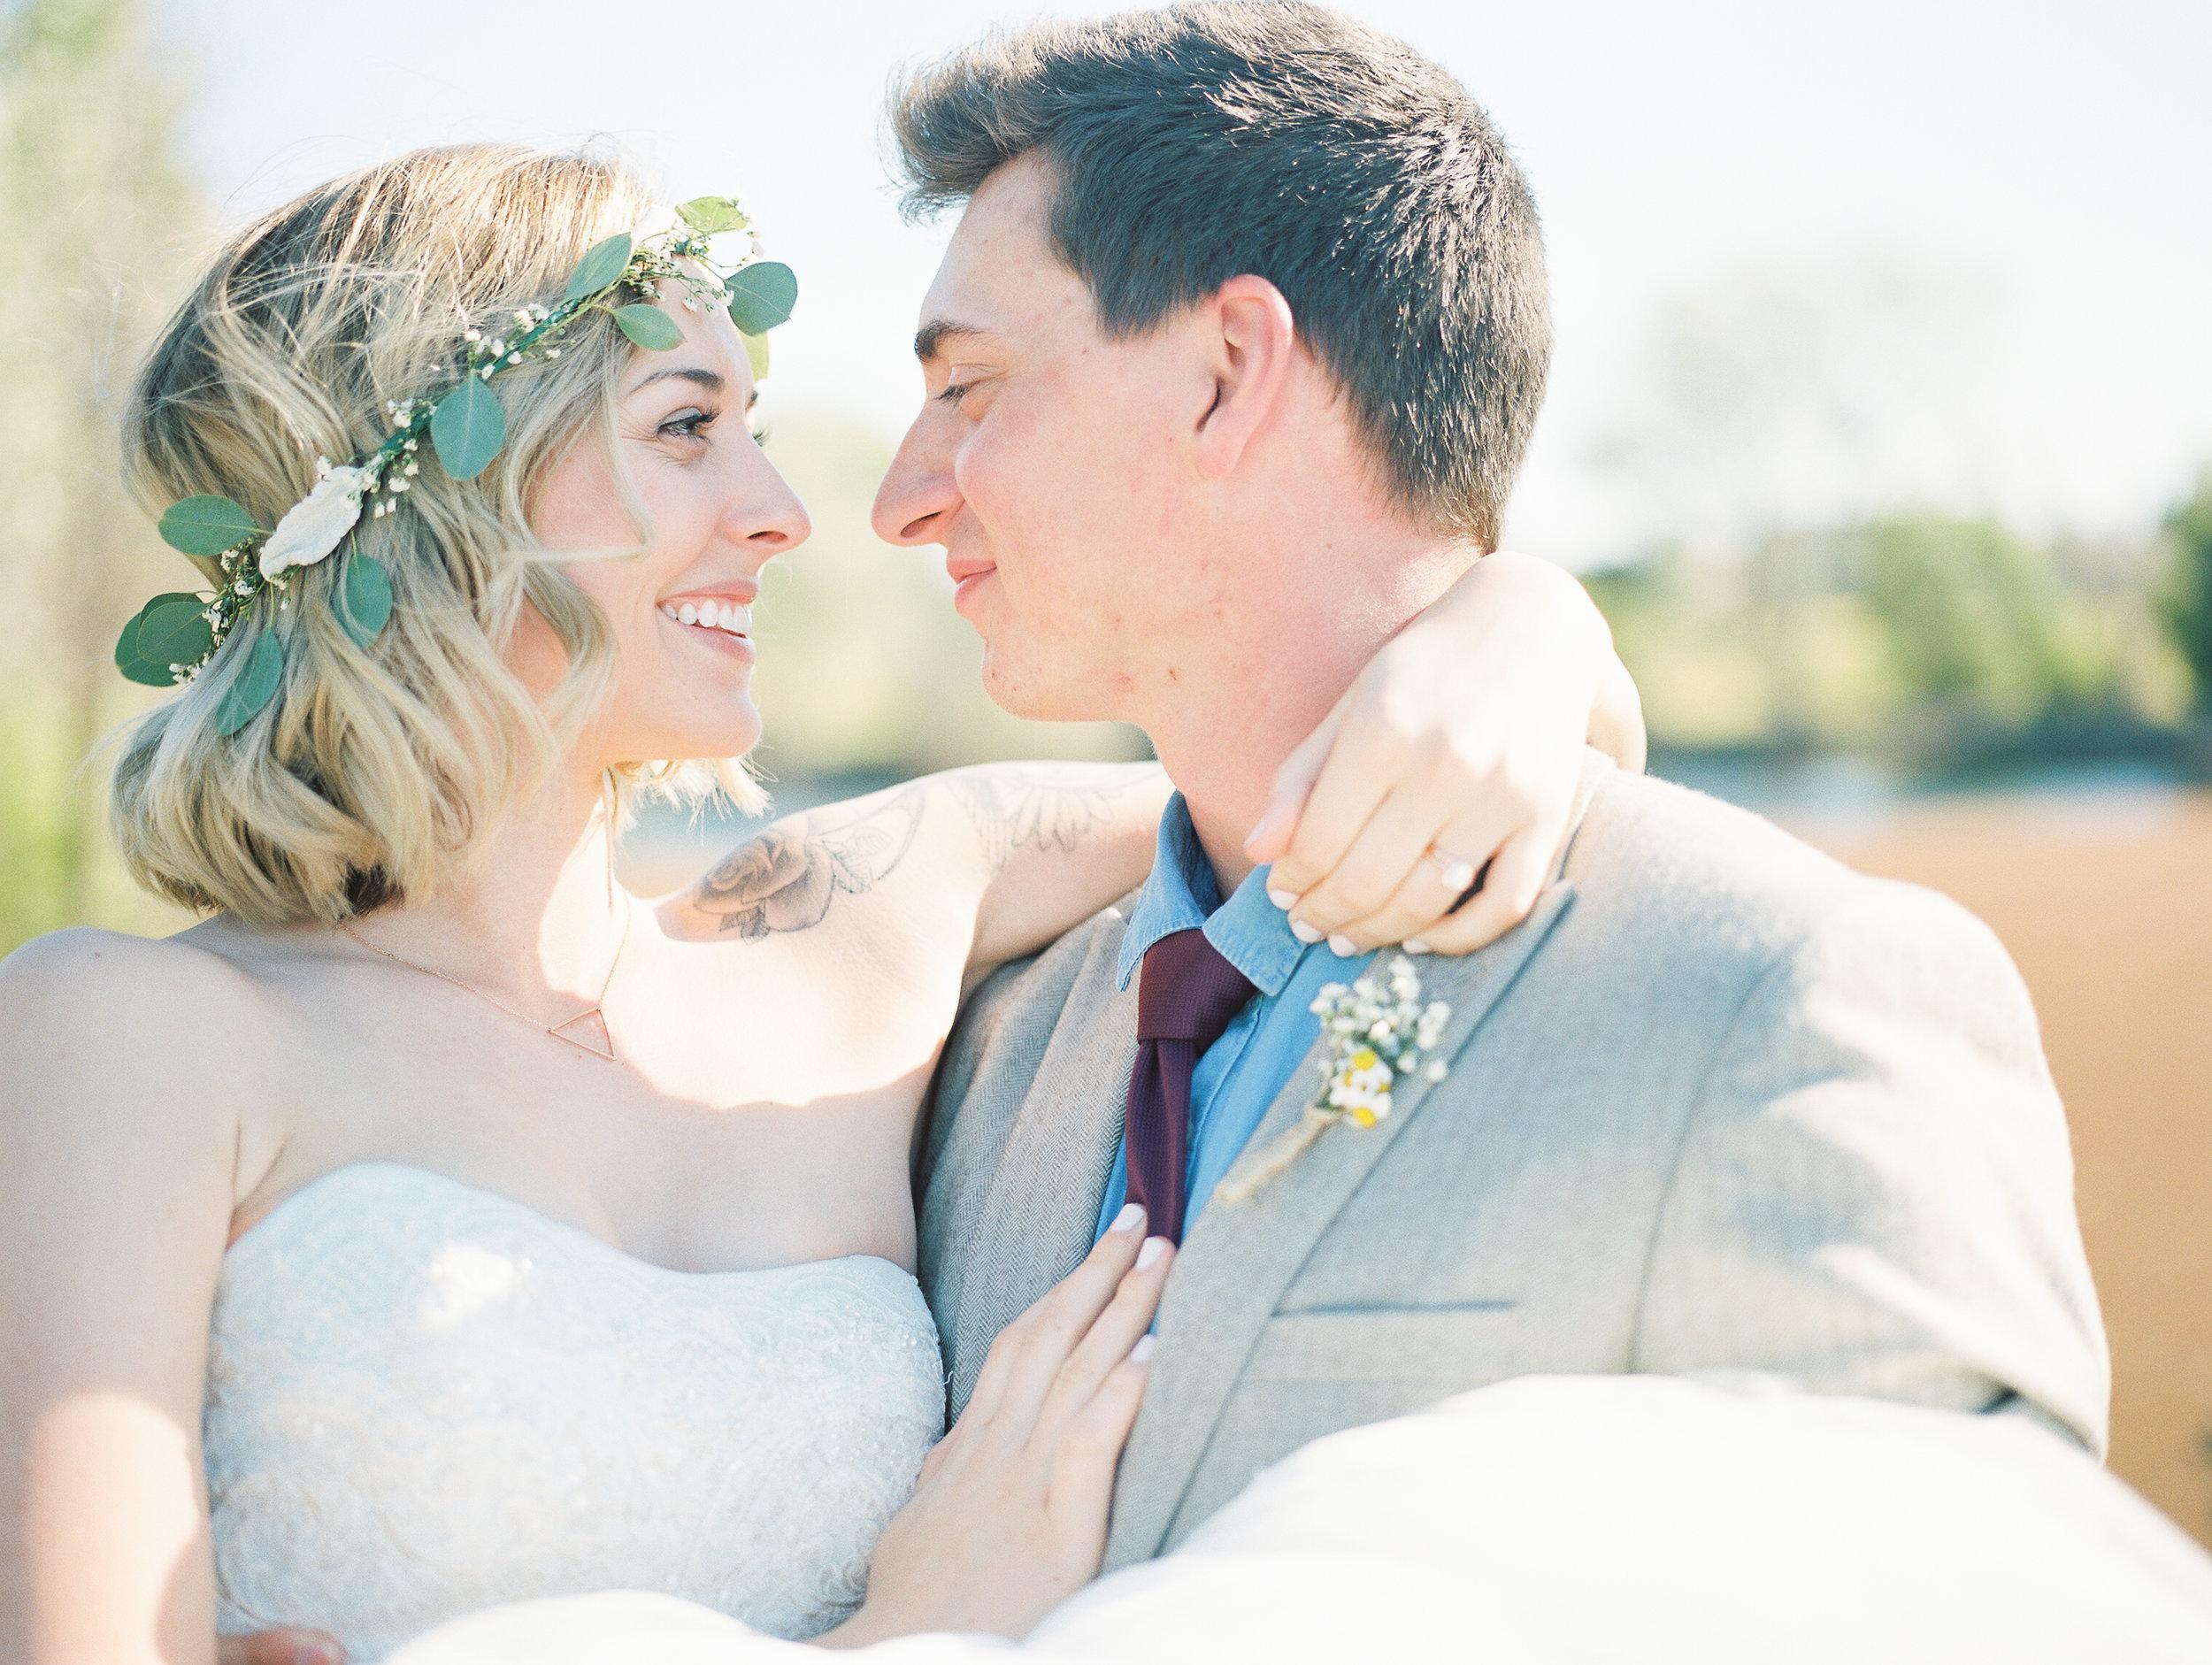 clayton+kennedy-married-filmscans-18.jpg